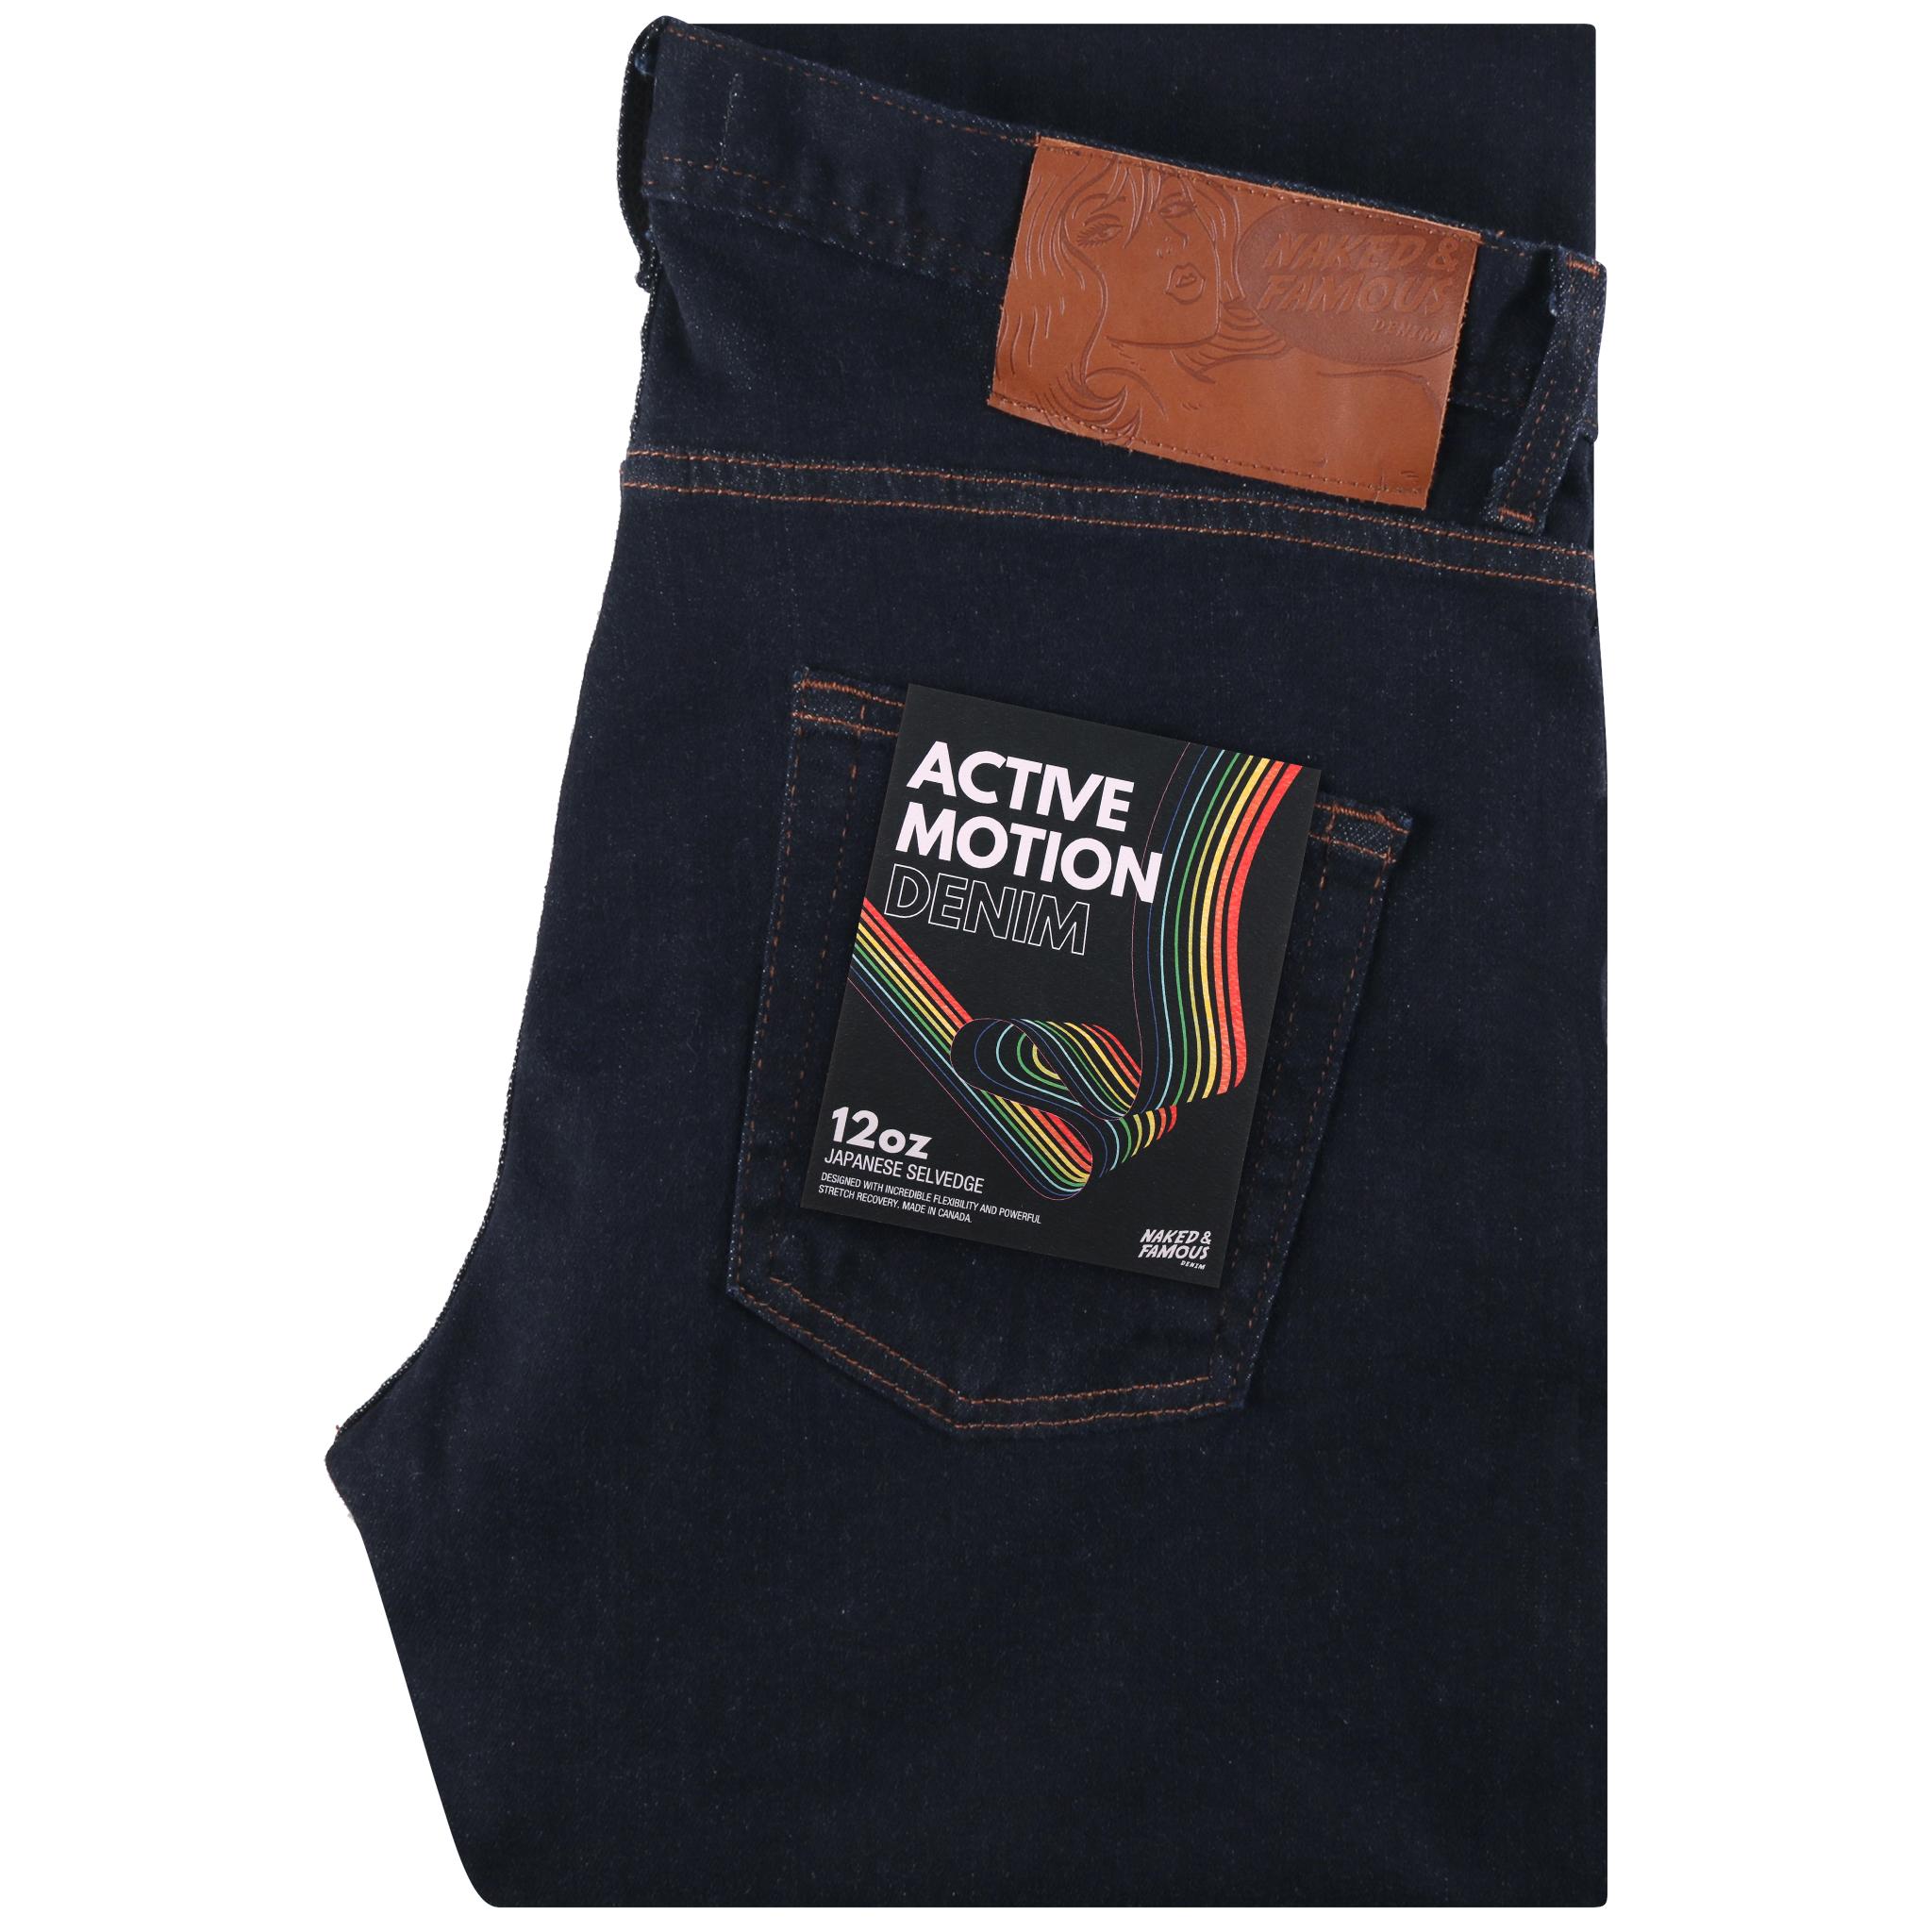 Active Motion Denim Jean Folded View